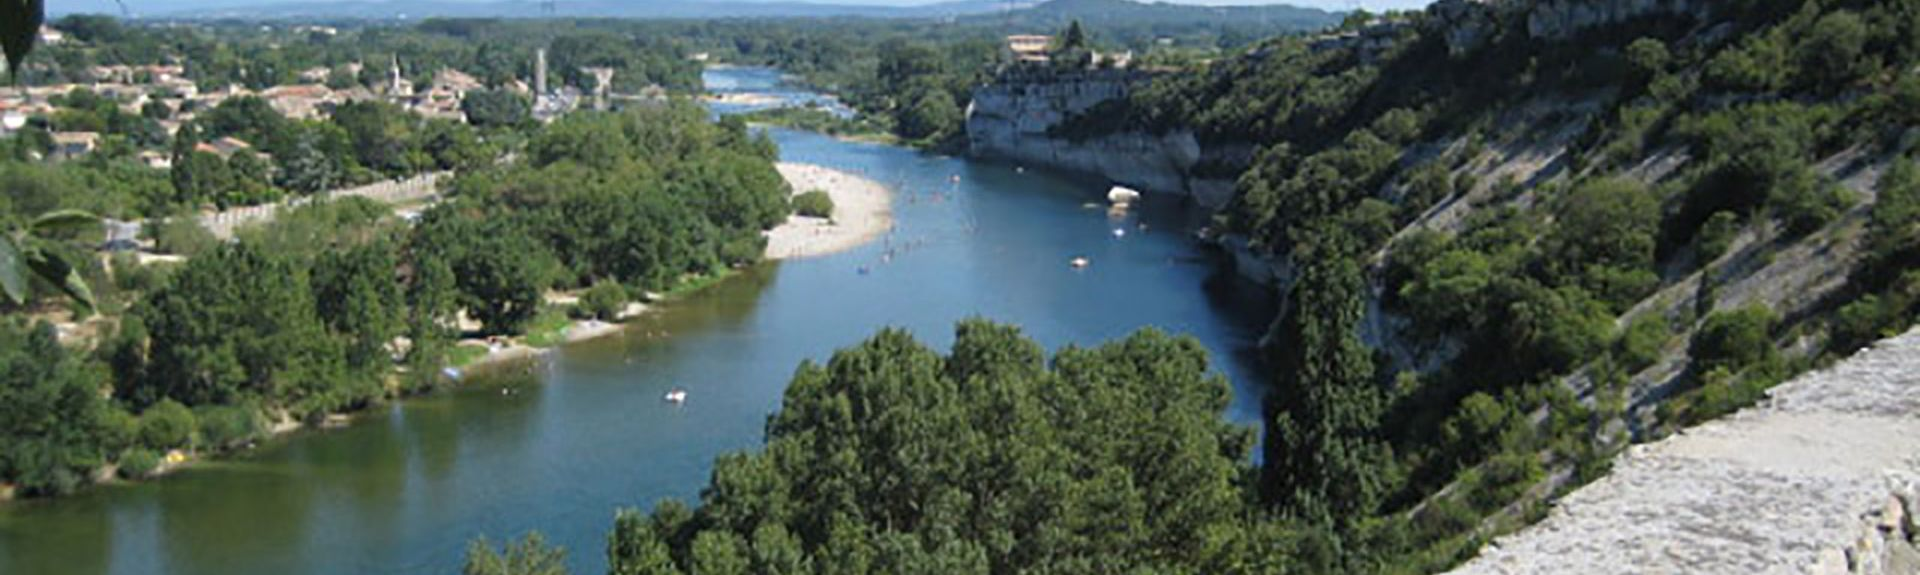 Orsan, Gard, France